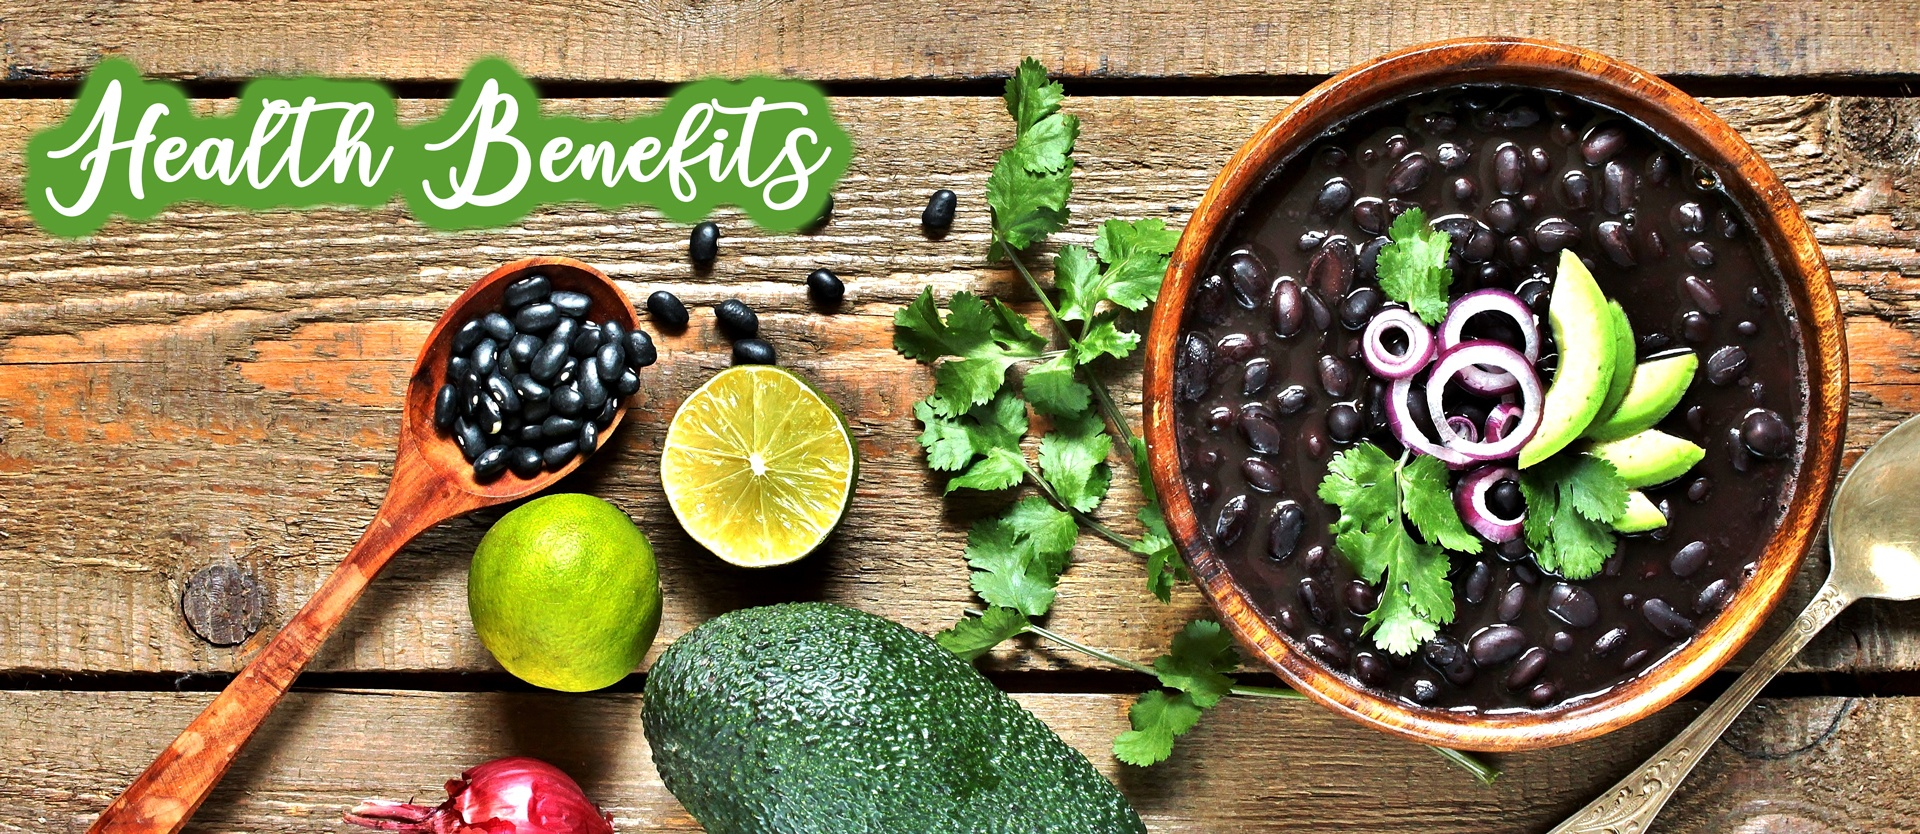 7 Health Benefits of Black Beans wellness captain